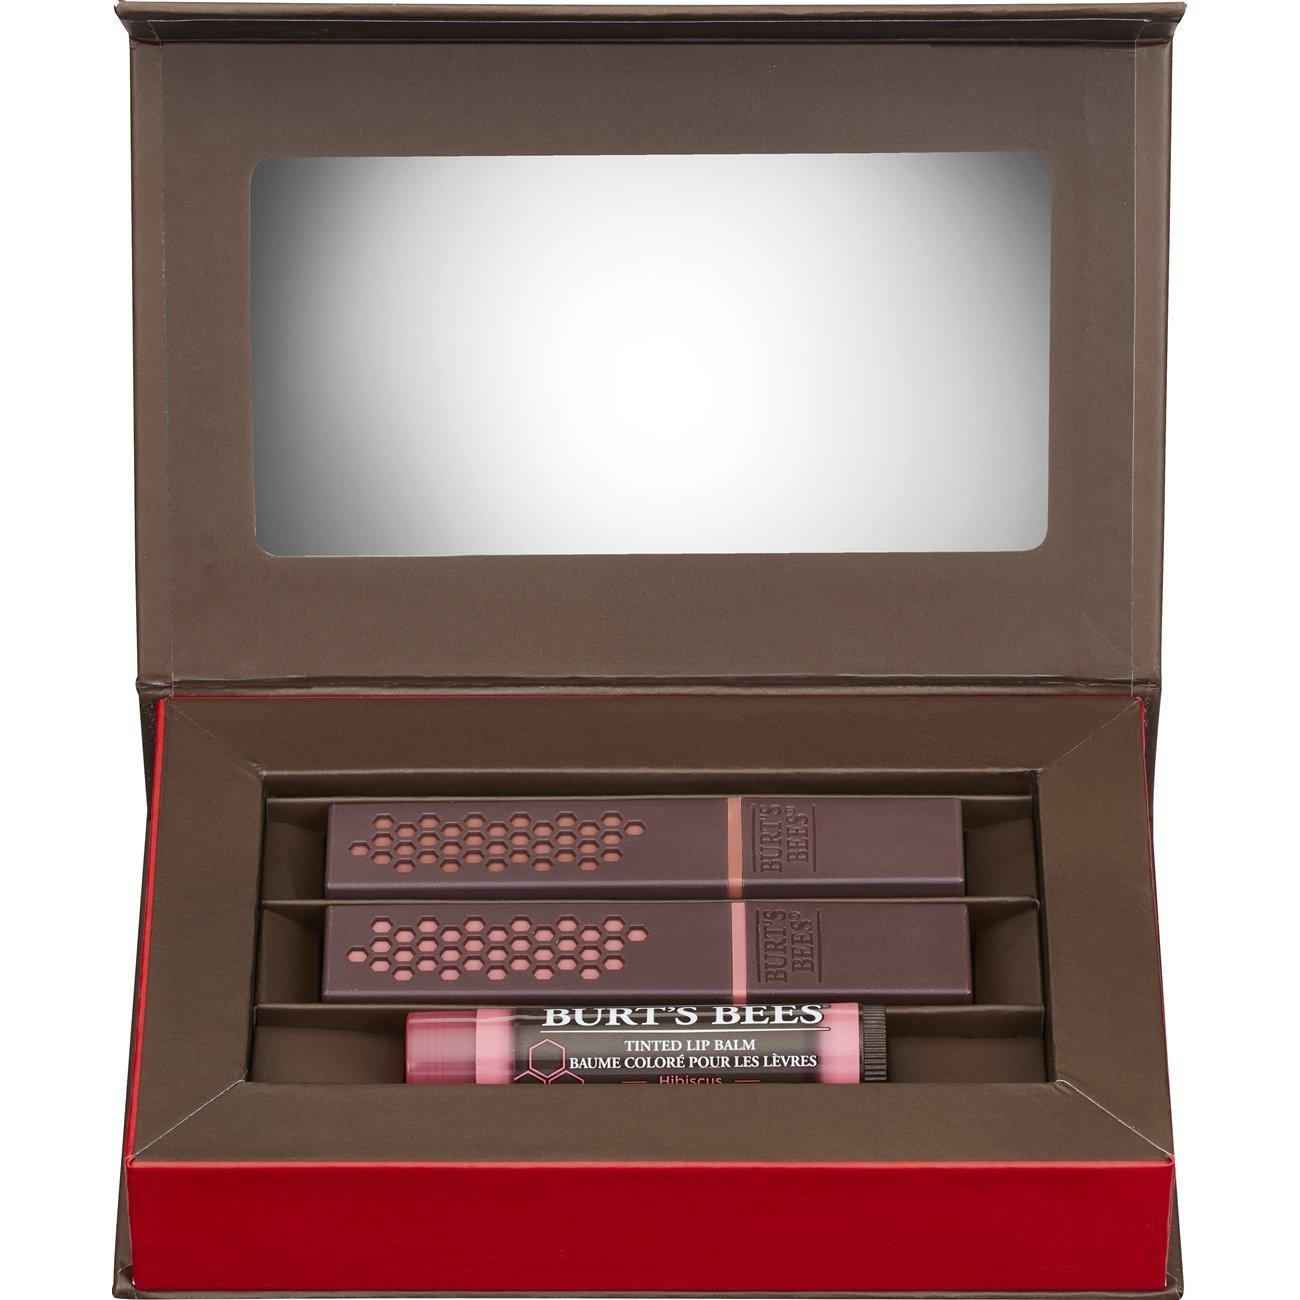 Burt's Bees Lip Color Trio Gift Set, 3 Lip Color Products - Blush Basin Lipstick, Suede Splash Lipstick and Hibiscus Tinted Lip Balm